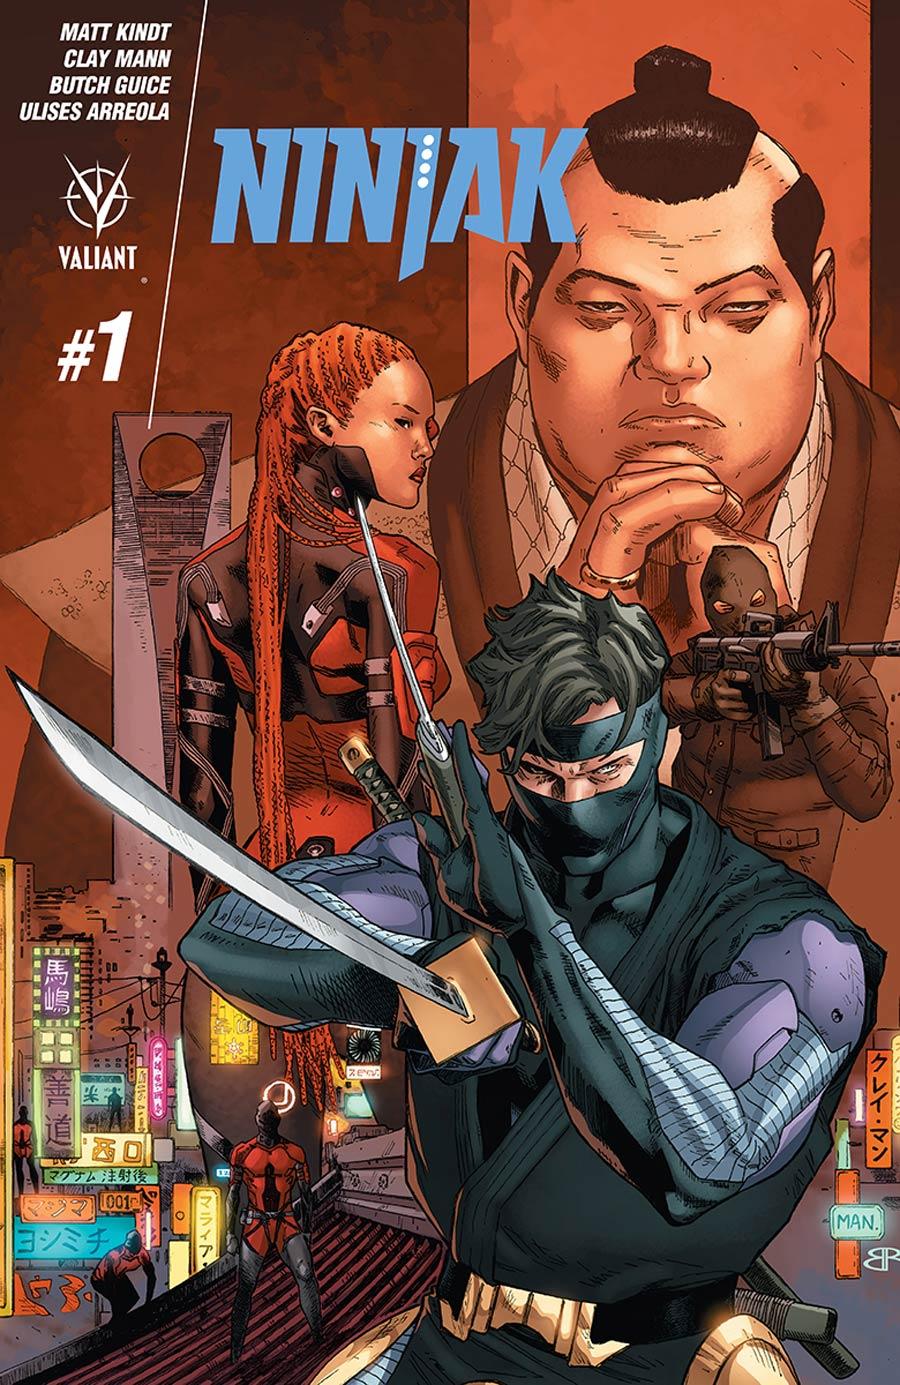 Ninjak Vol 3 #1 Cover B Variant Clay Mann Cover